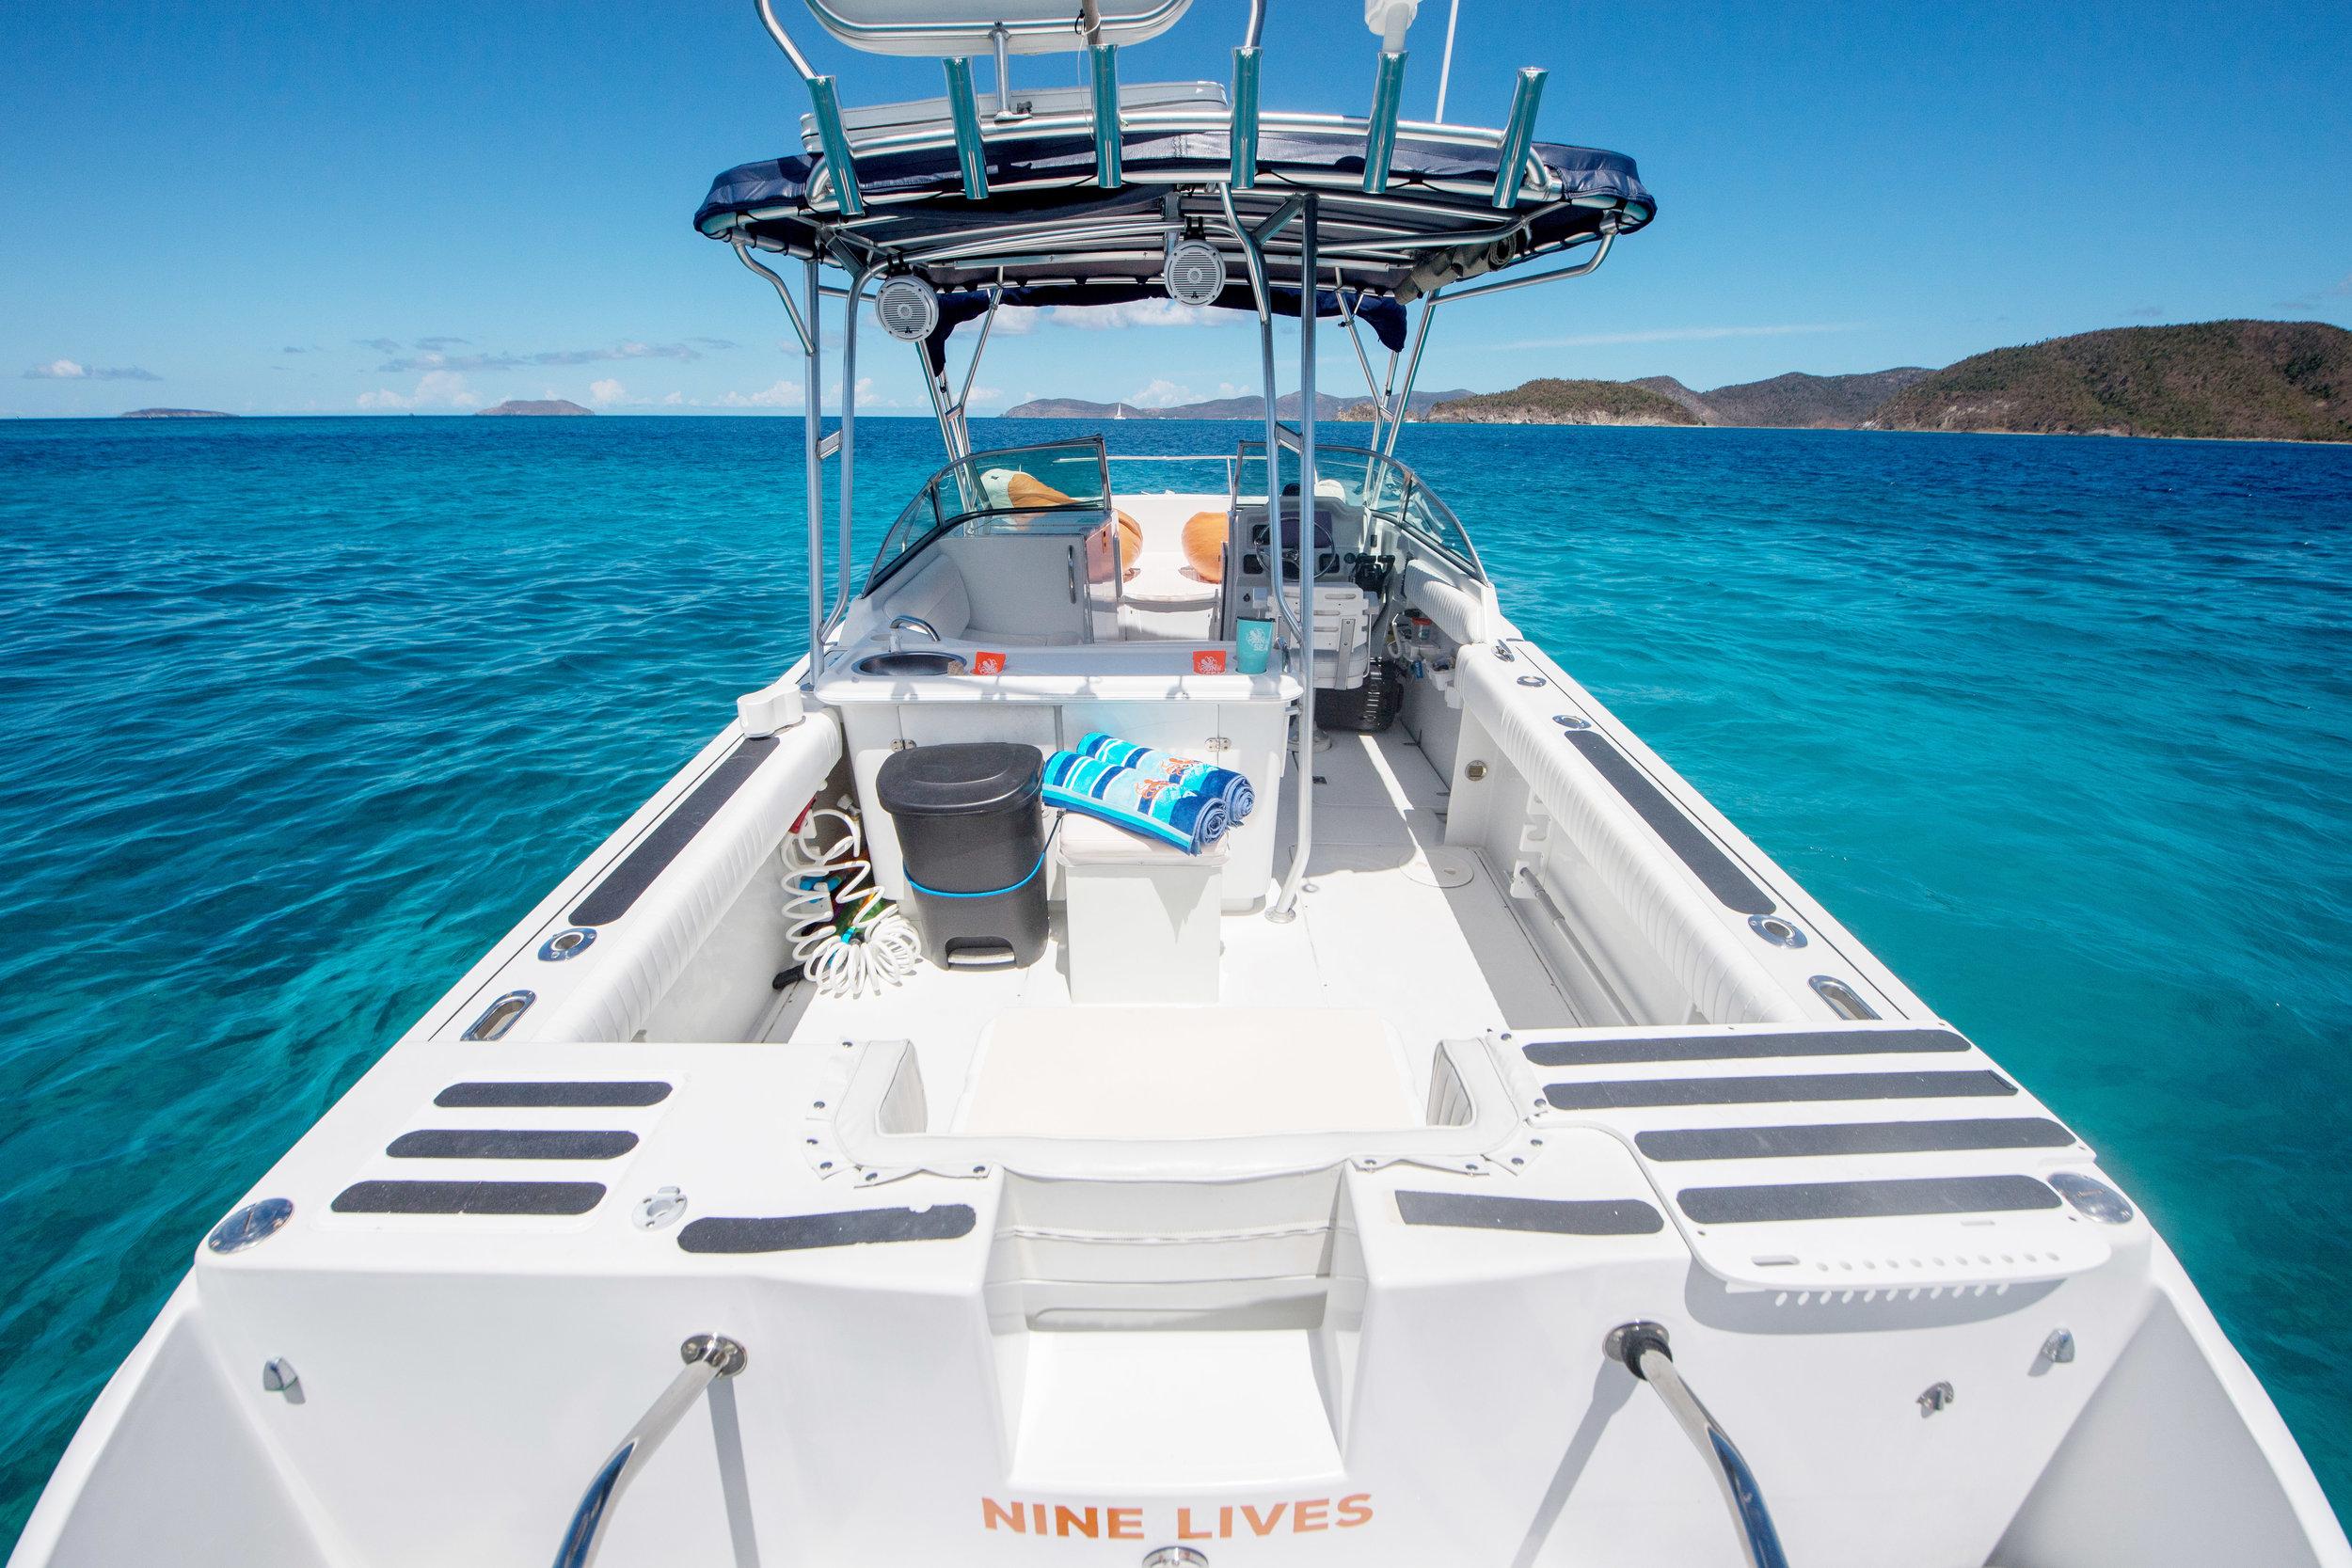 on-the-sea-charters-9-lives-2b.jpg